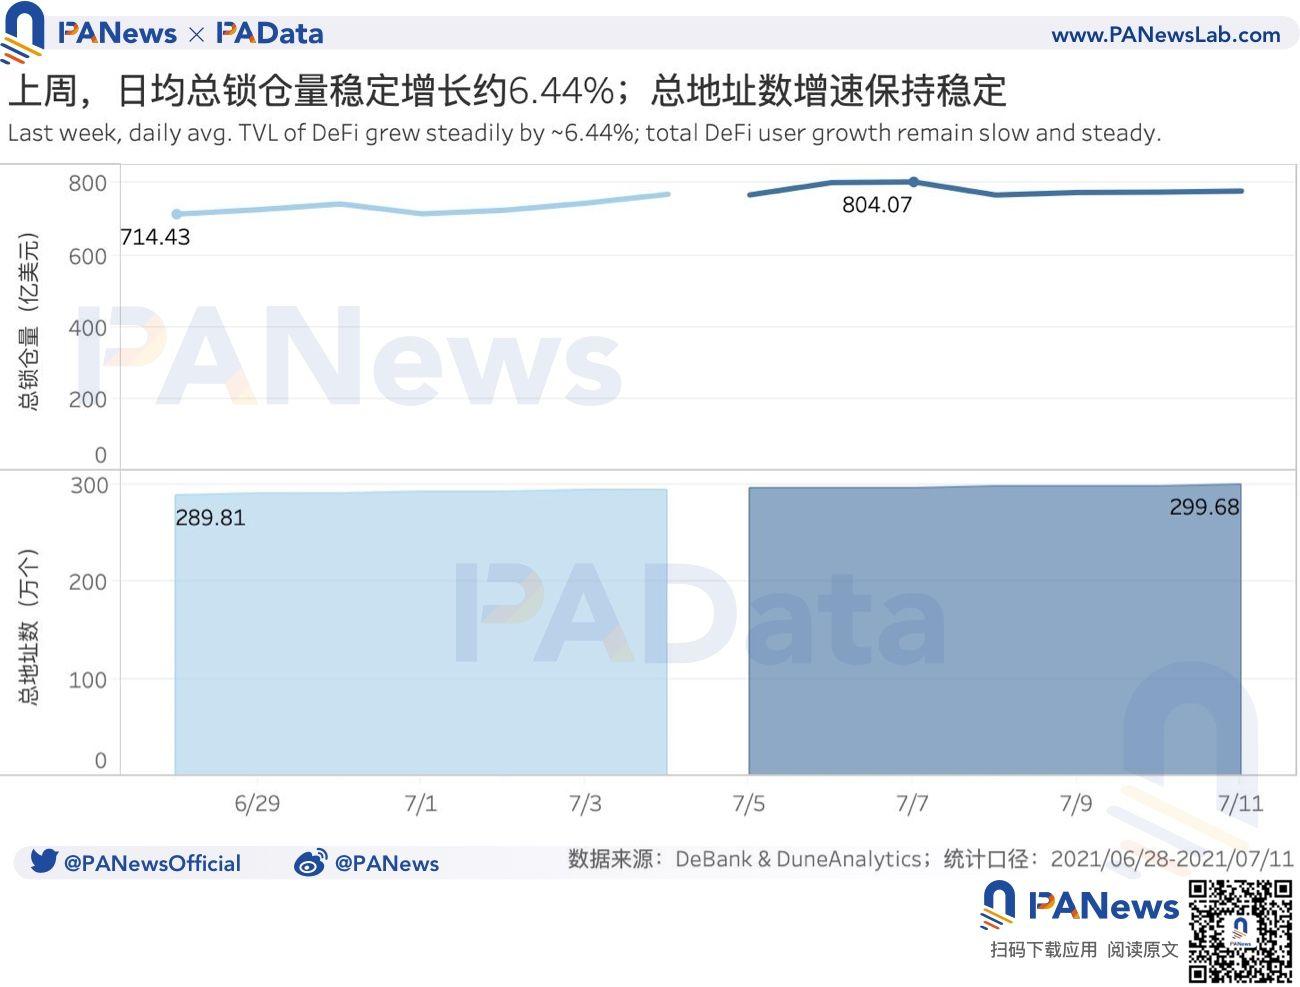 DeFi一周回顾:总锁仓量稳中上升超6%,Uniswap V3交易量7日降幅超40%